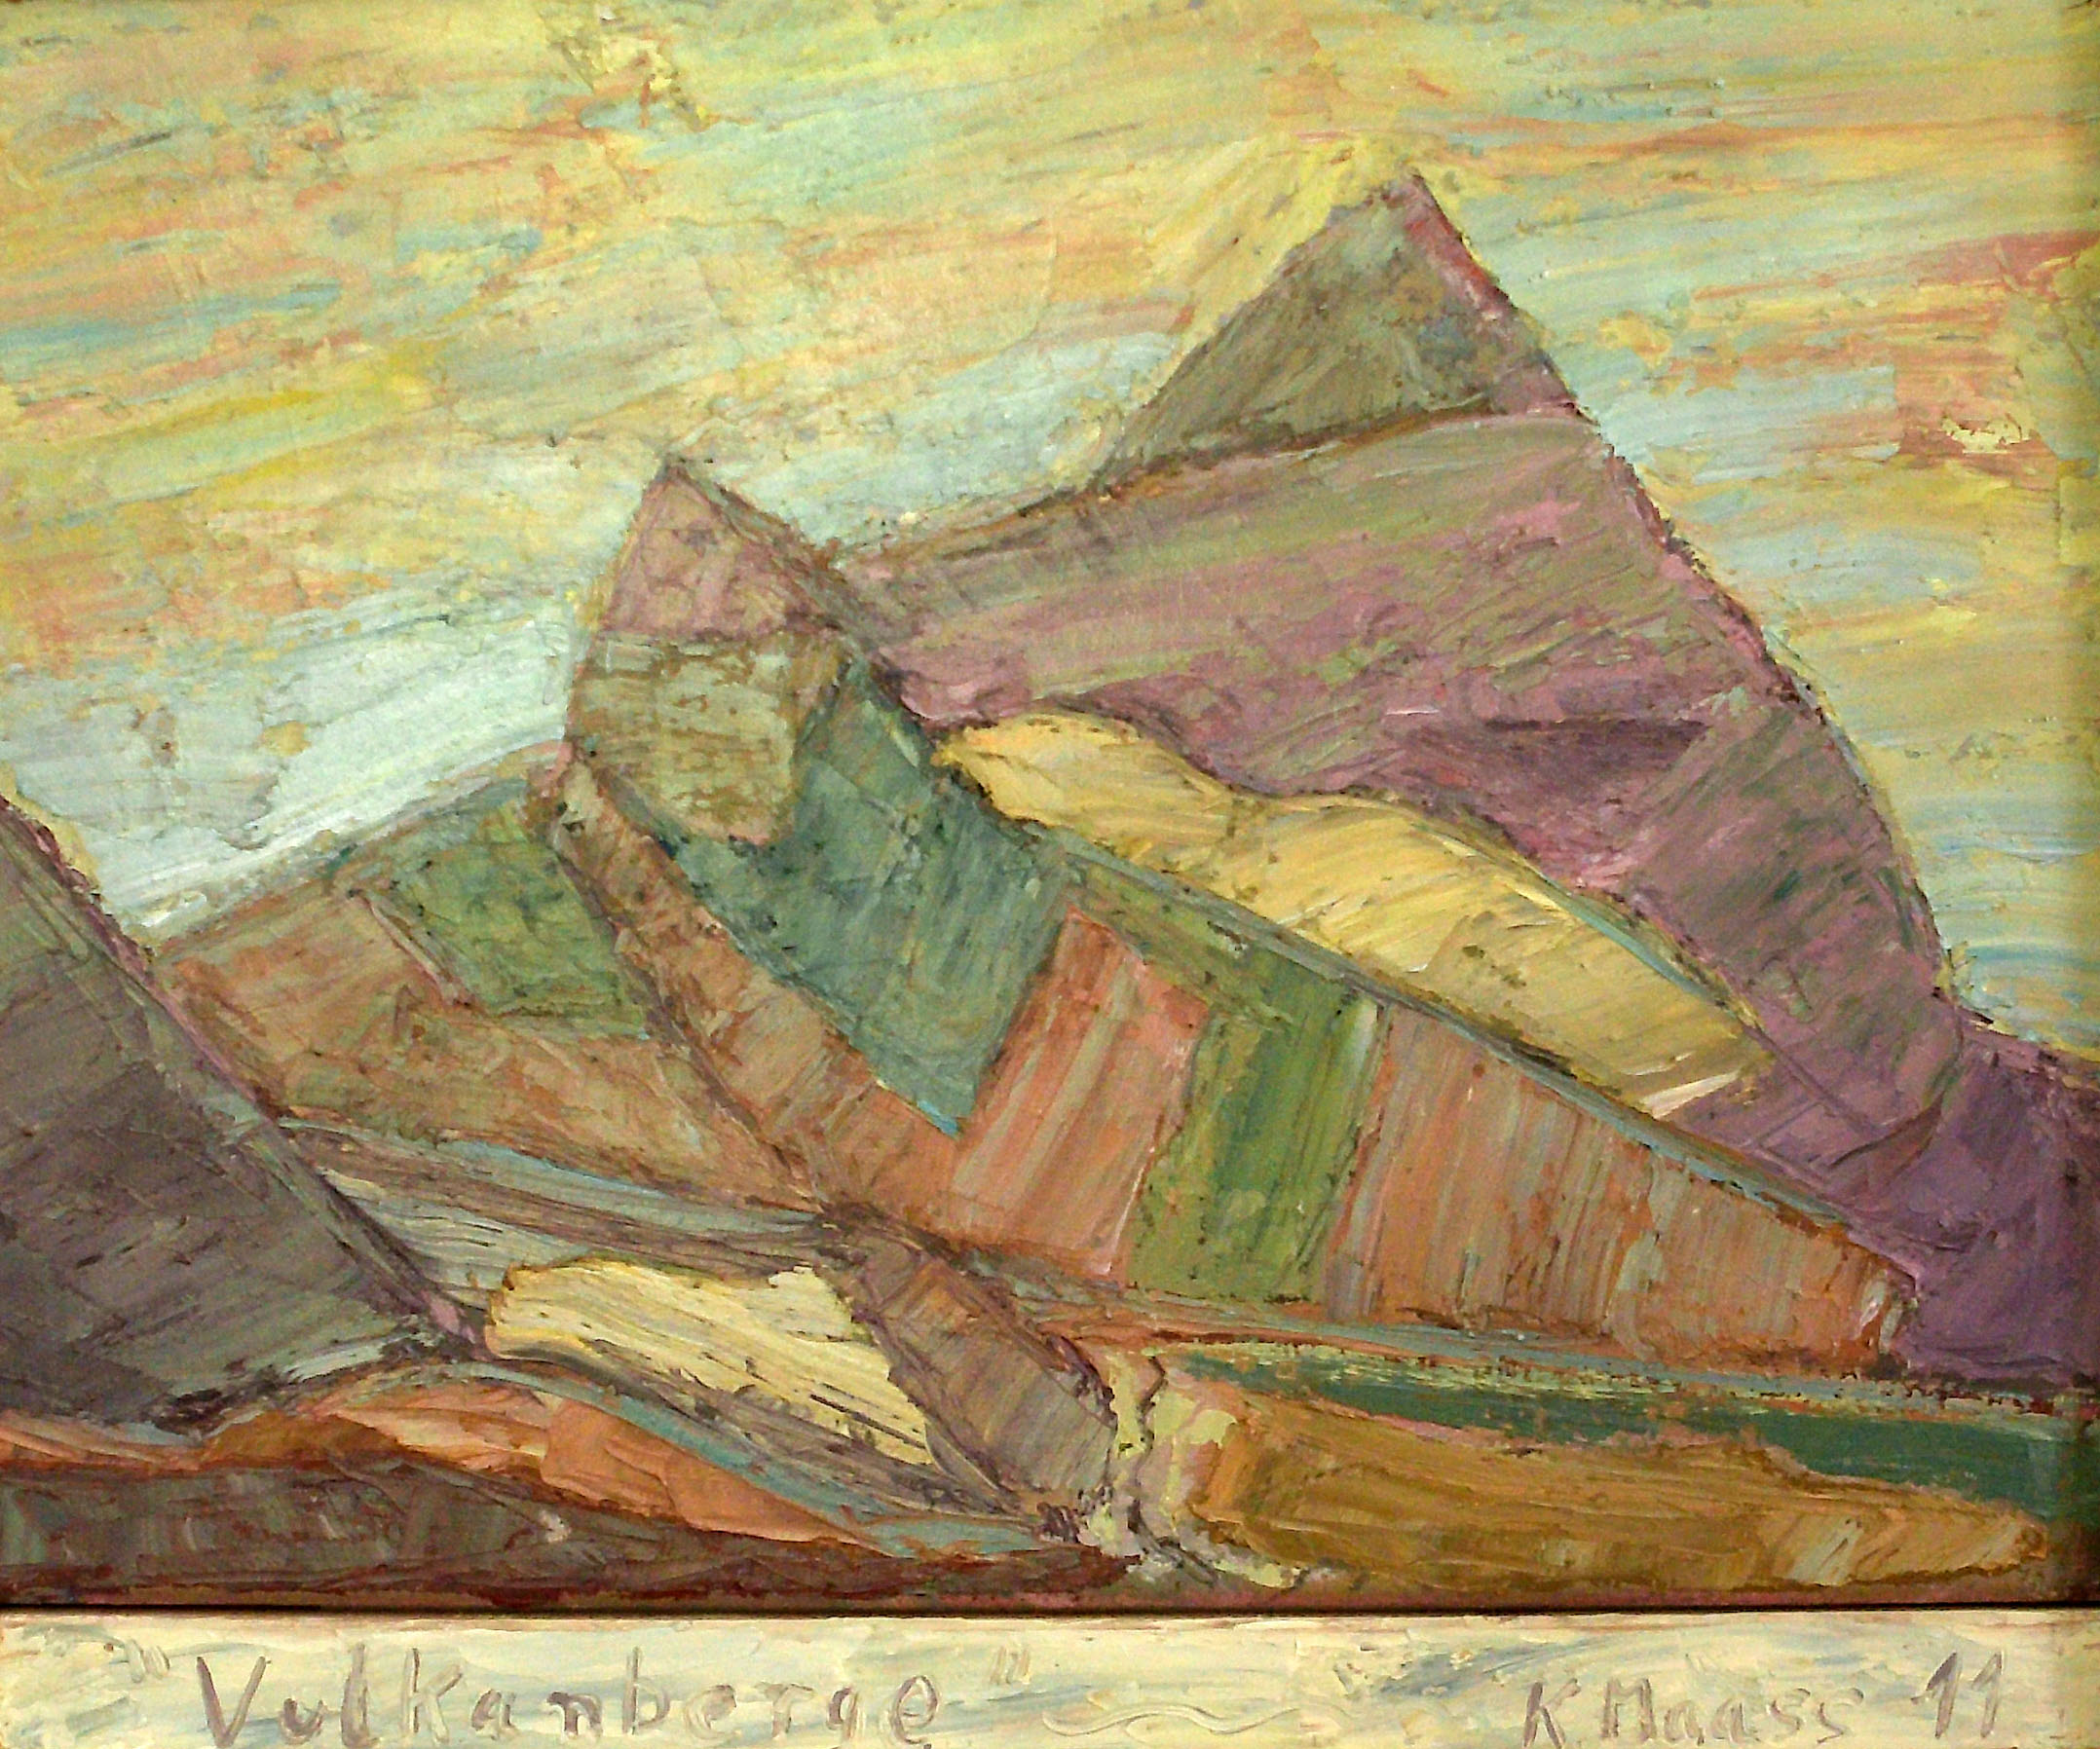 18-konrad_maass-vulkanberge-lanzarote-2011-oel_auf_leinwand-55x60